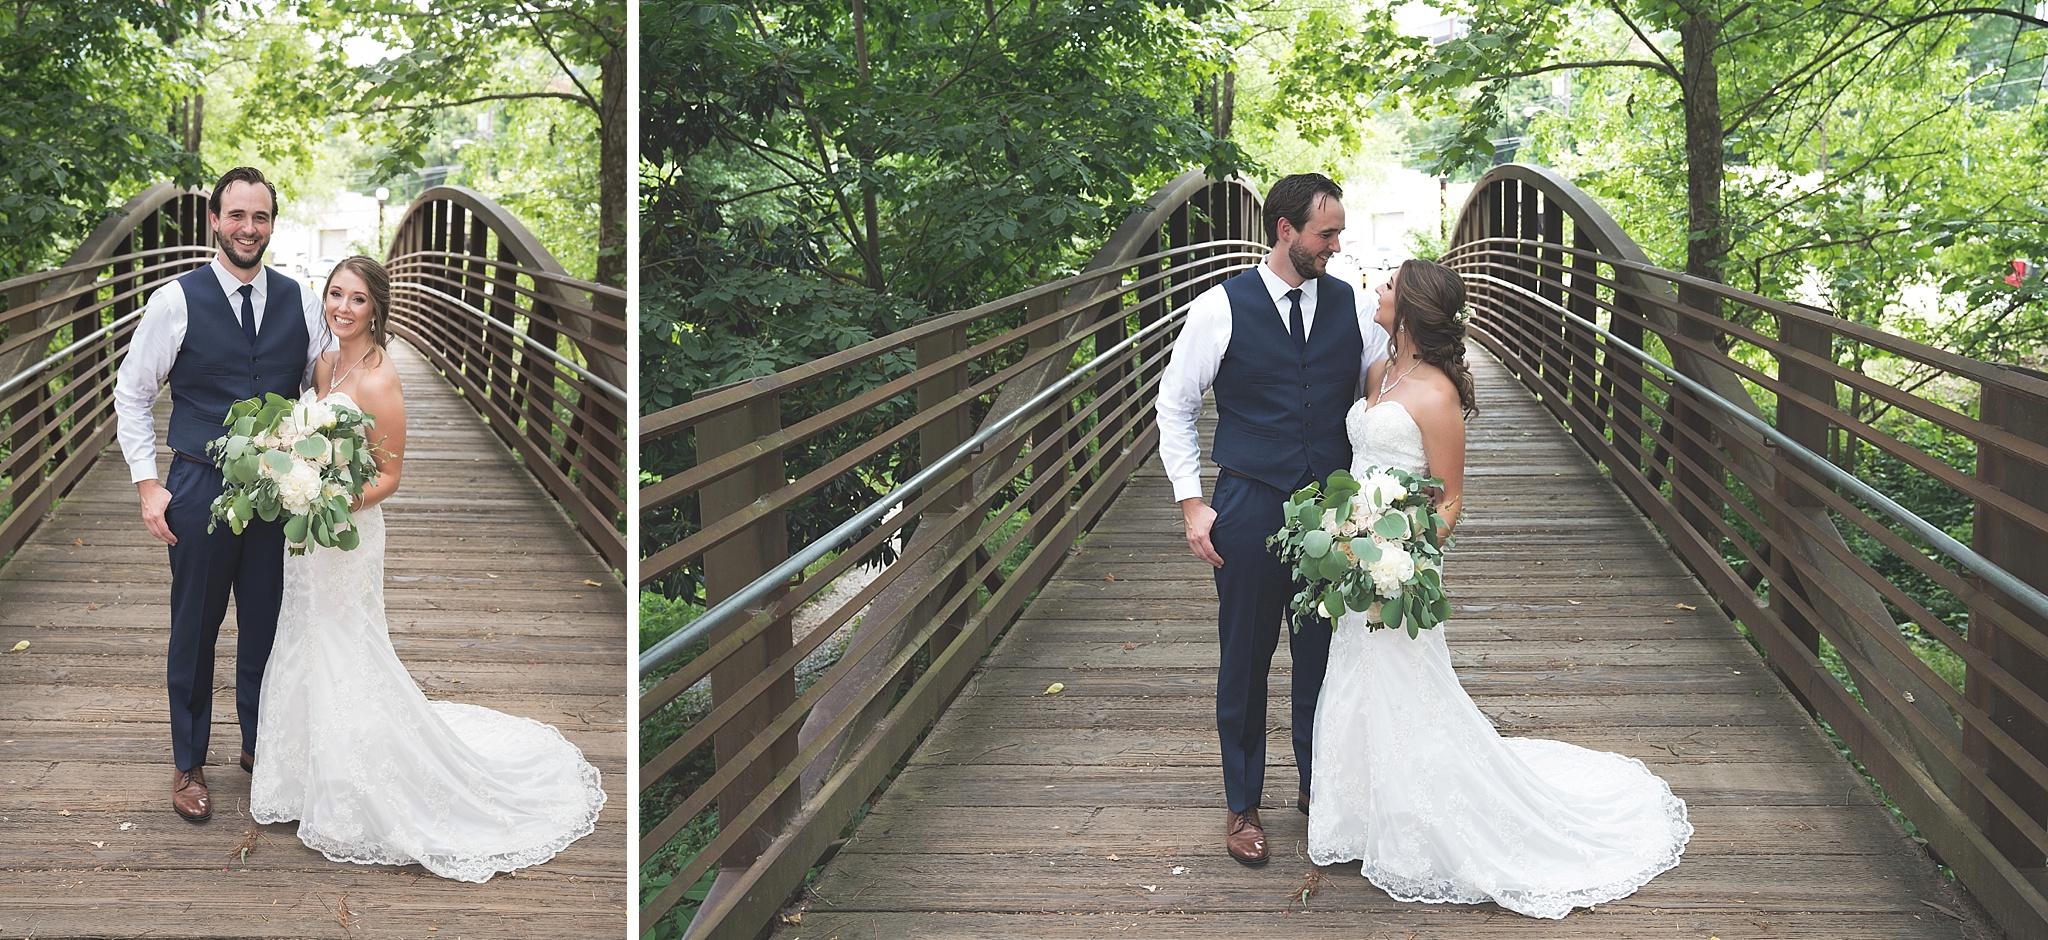 Rickhouse-Durham-NC-Wedding-Photographer-034.jpg